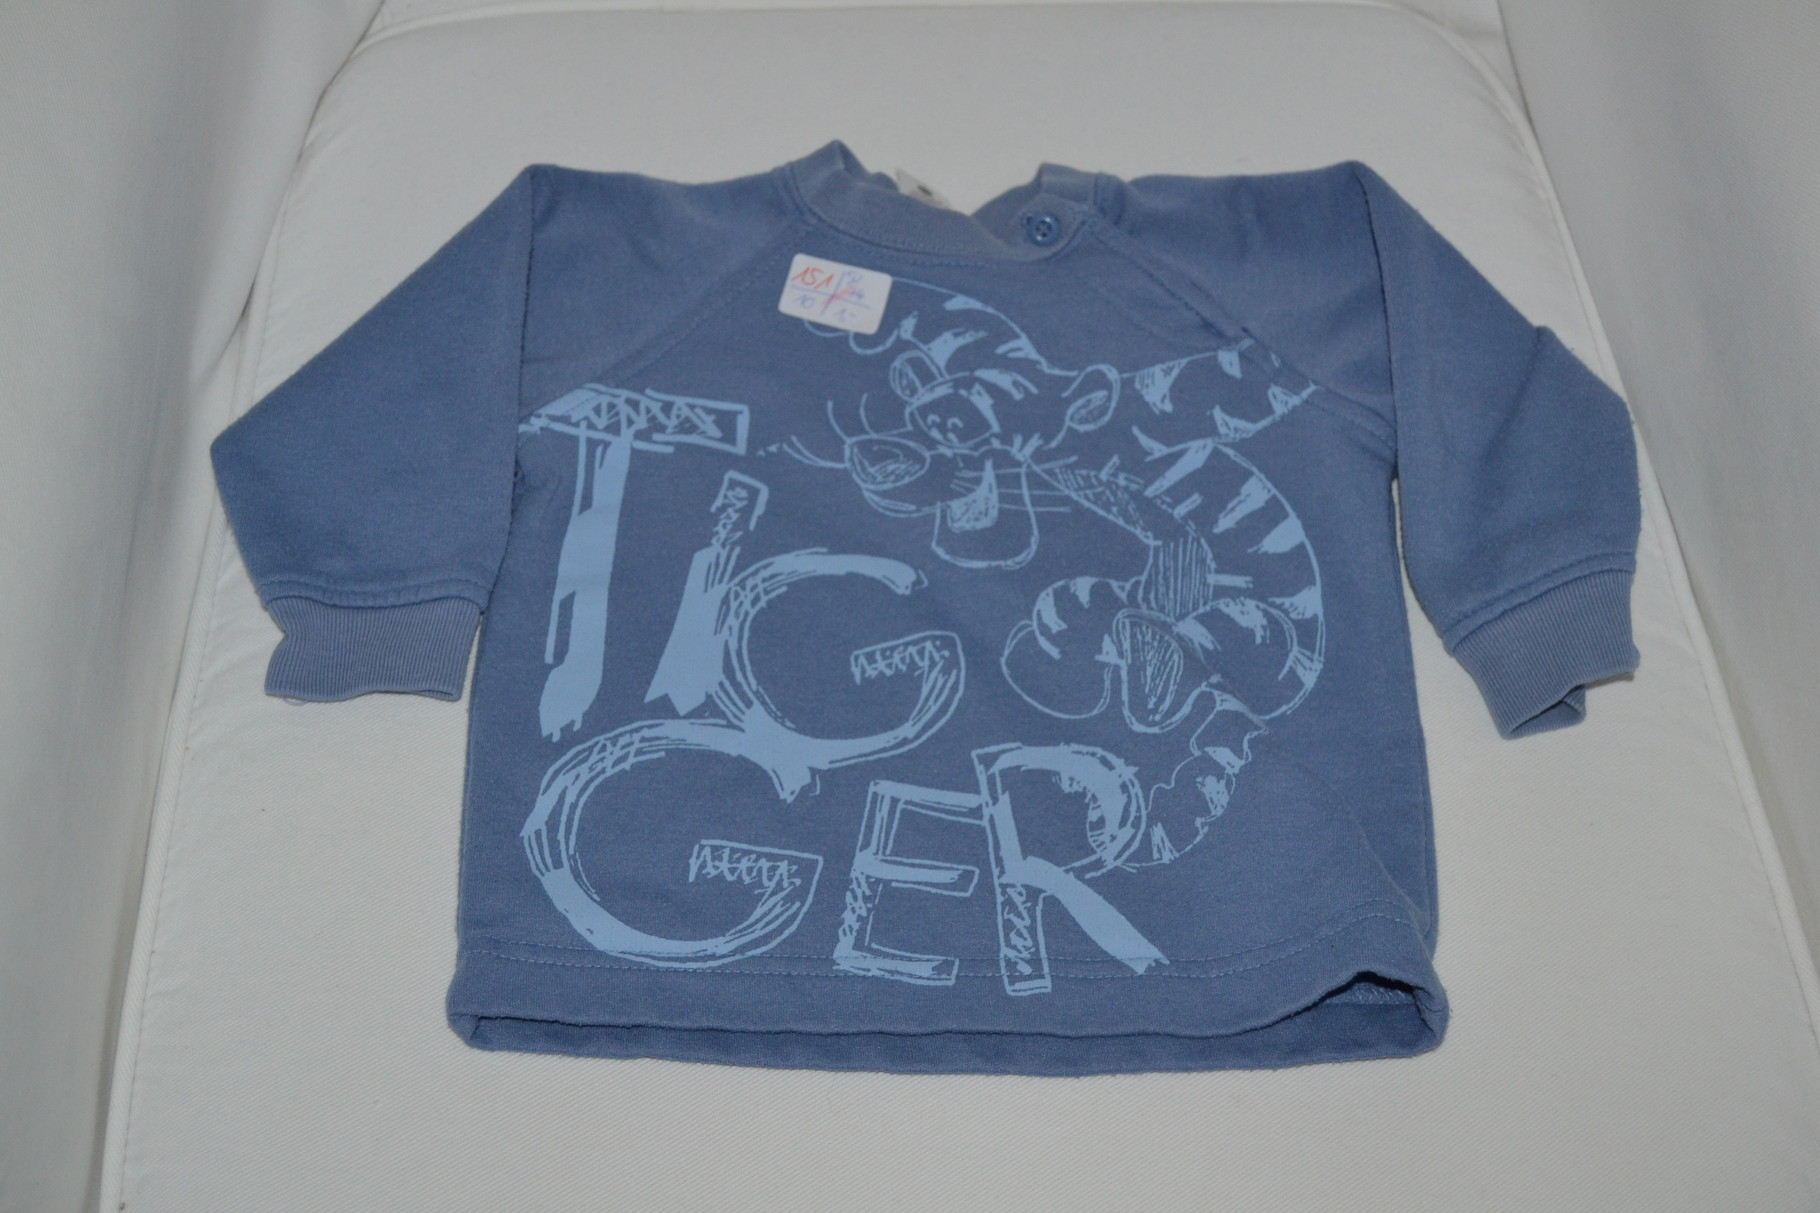 Tigger Pullover von C&A - Gr. 74 - 1,- €